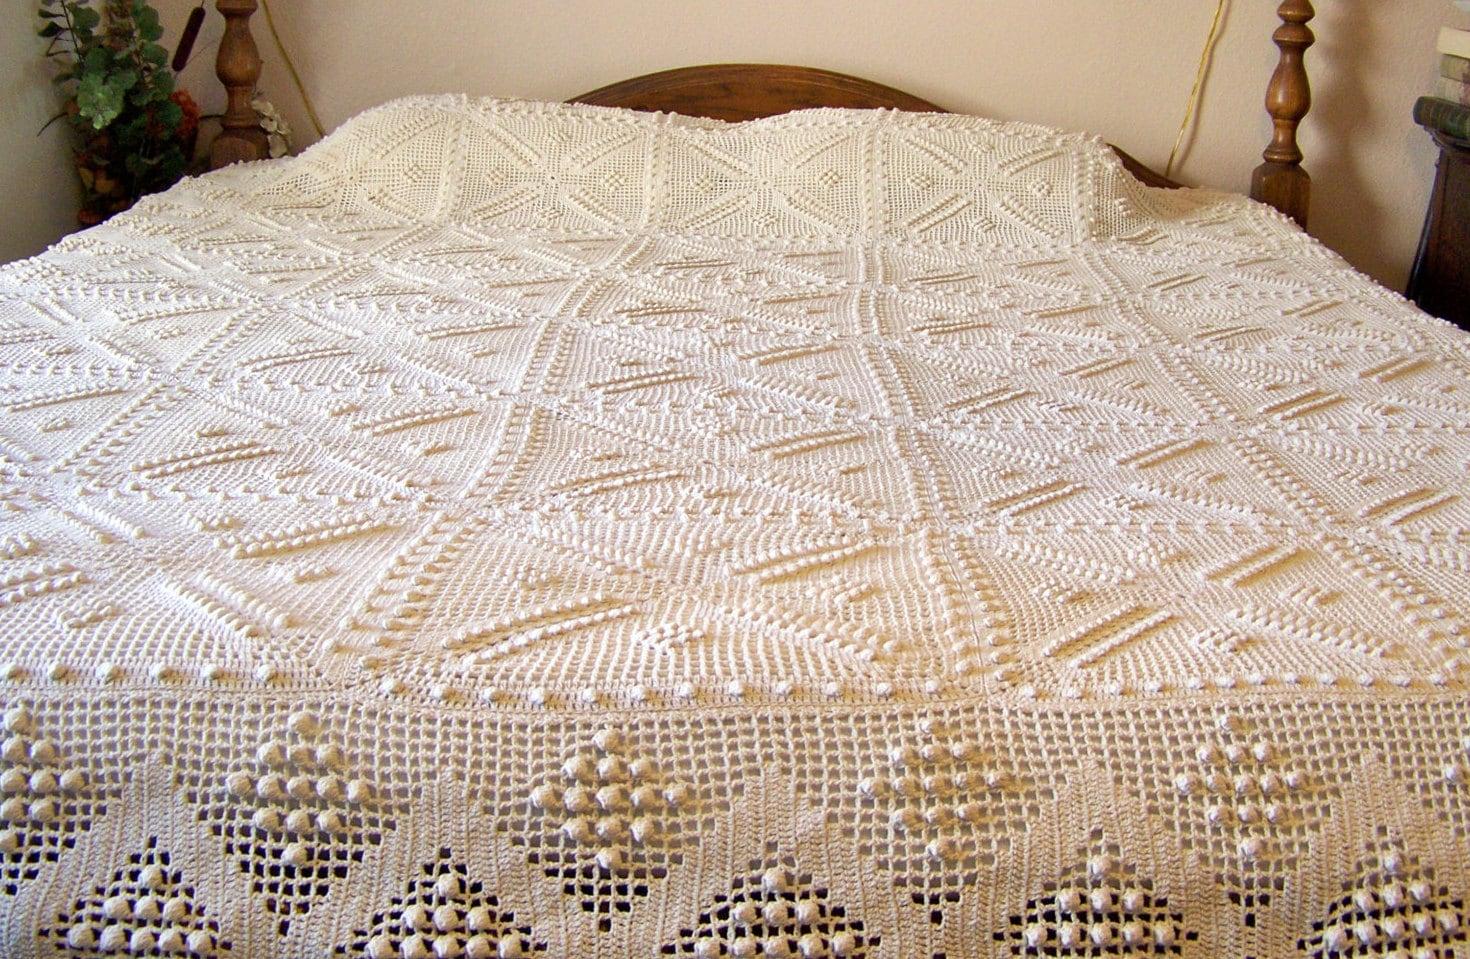 Antique Crochet Bedspread Heirloom Quality Hand Crochet